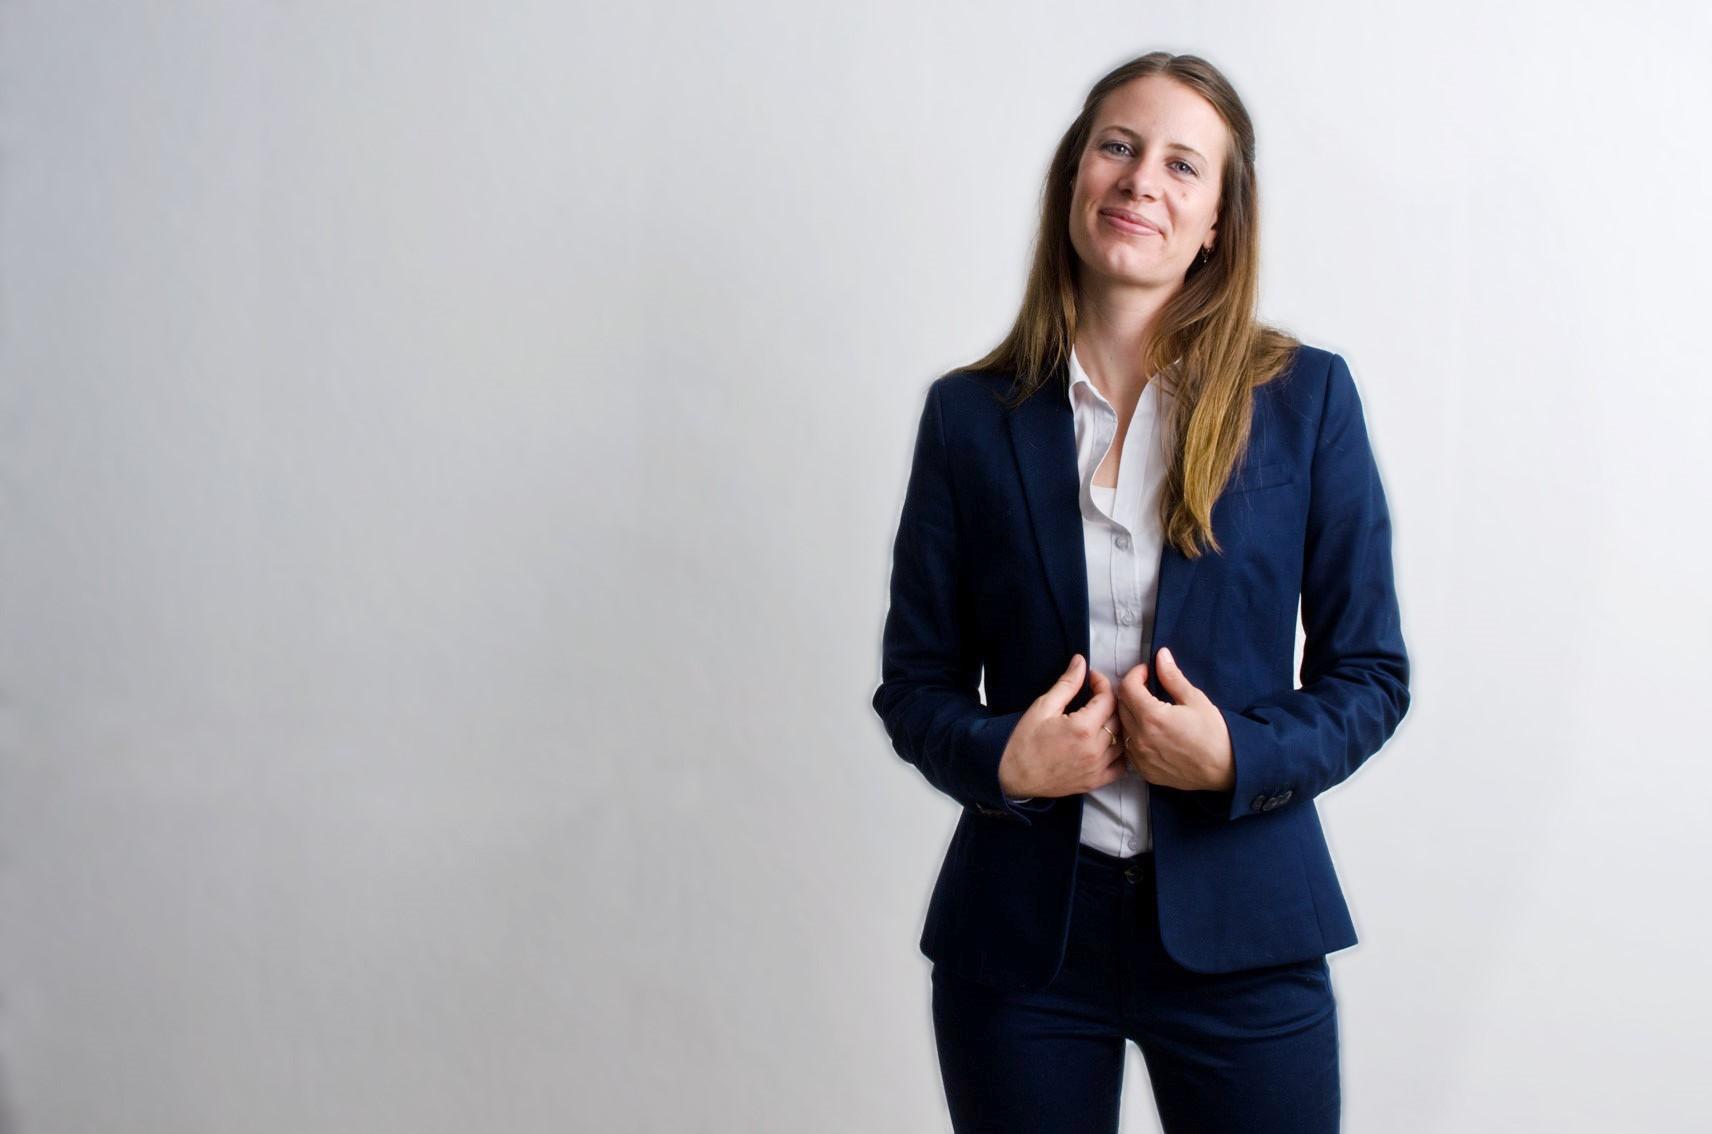 Kanzlei Laible | Greiner | Partner Rechtsanwälte Lindau Dinah Bauer